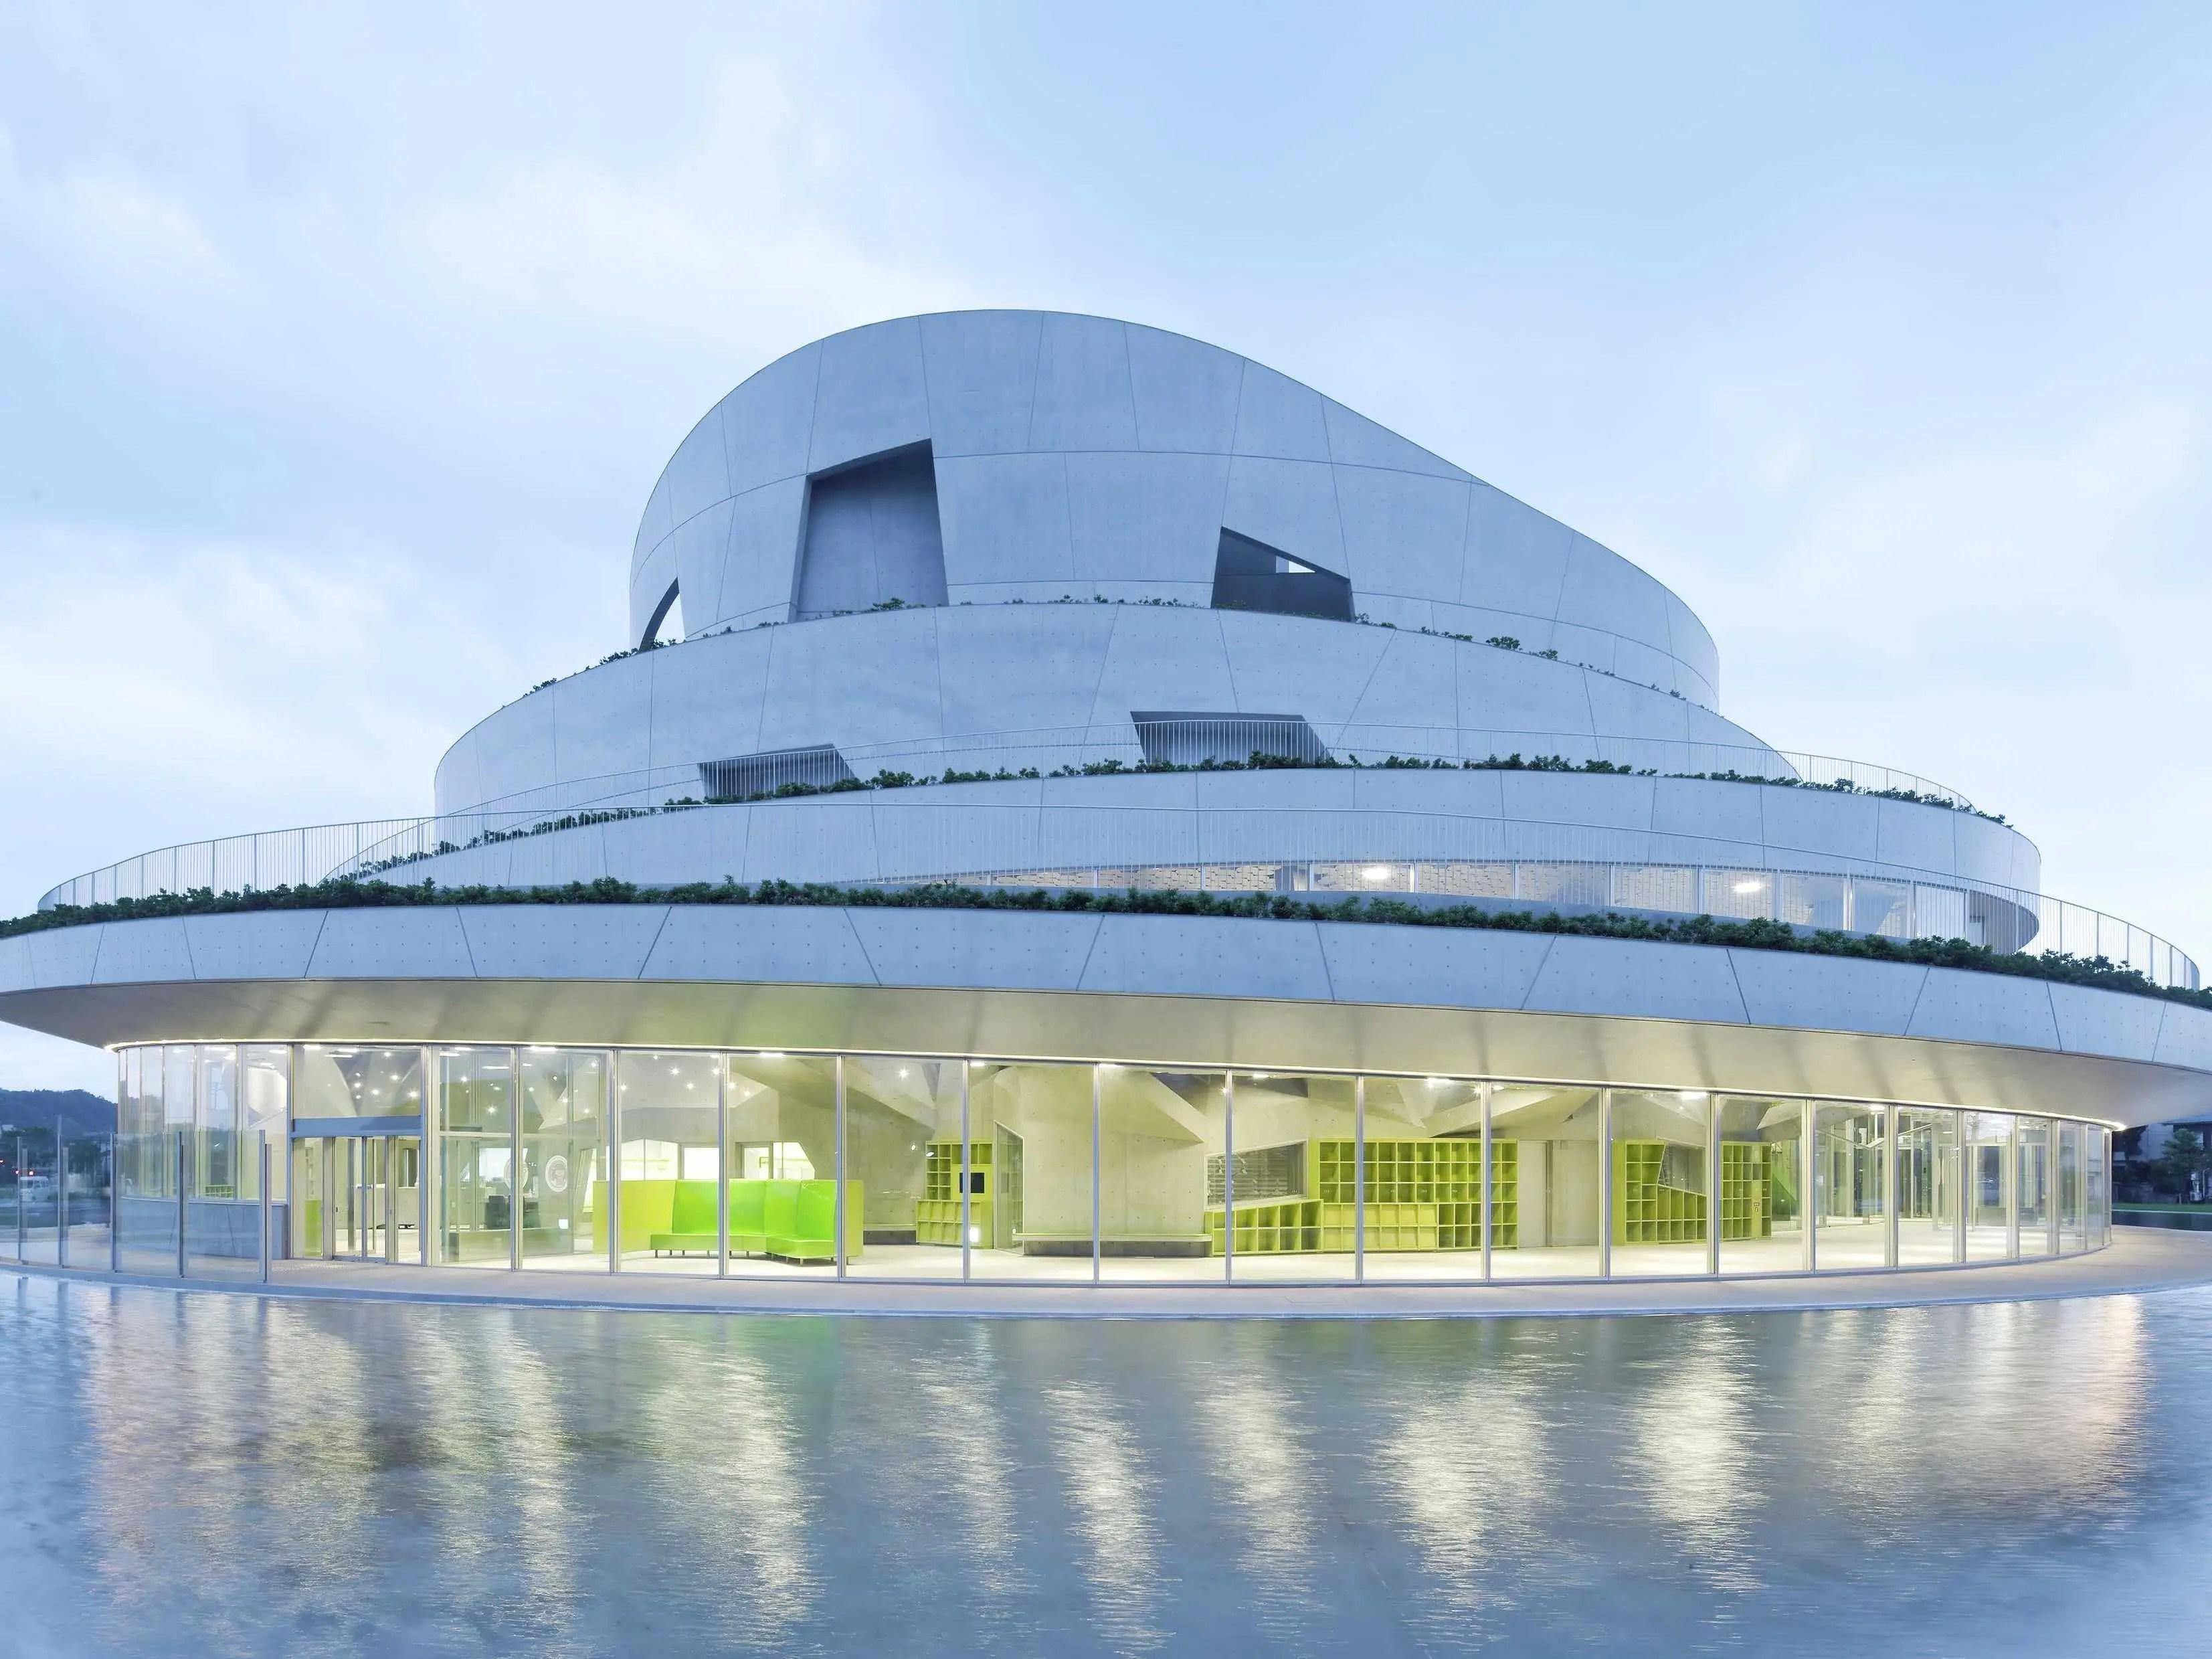 Akiha Ward Cultural Center by Chiaki Arai Urban and Architecture Design, Niigata, Japan (shortlisted in Culture)